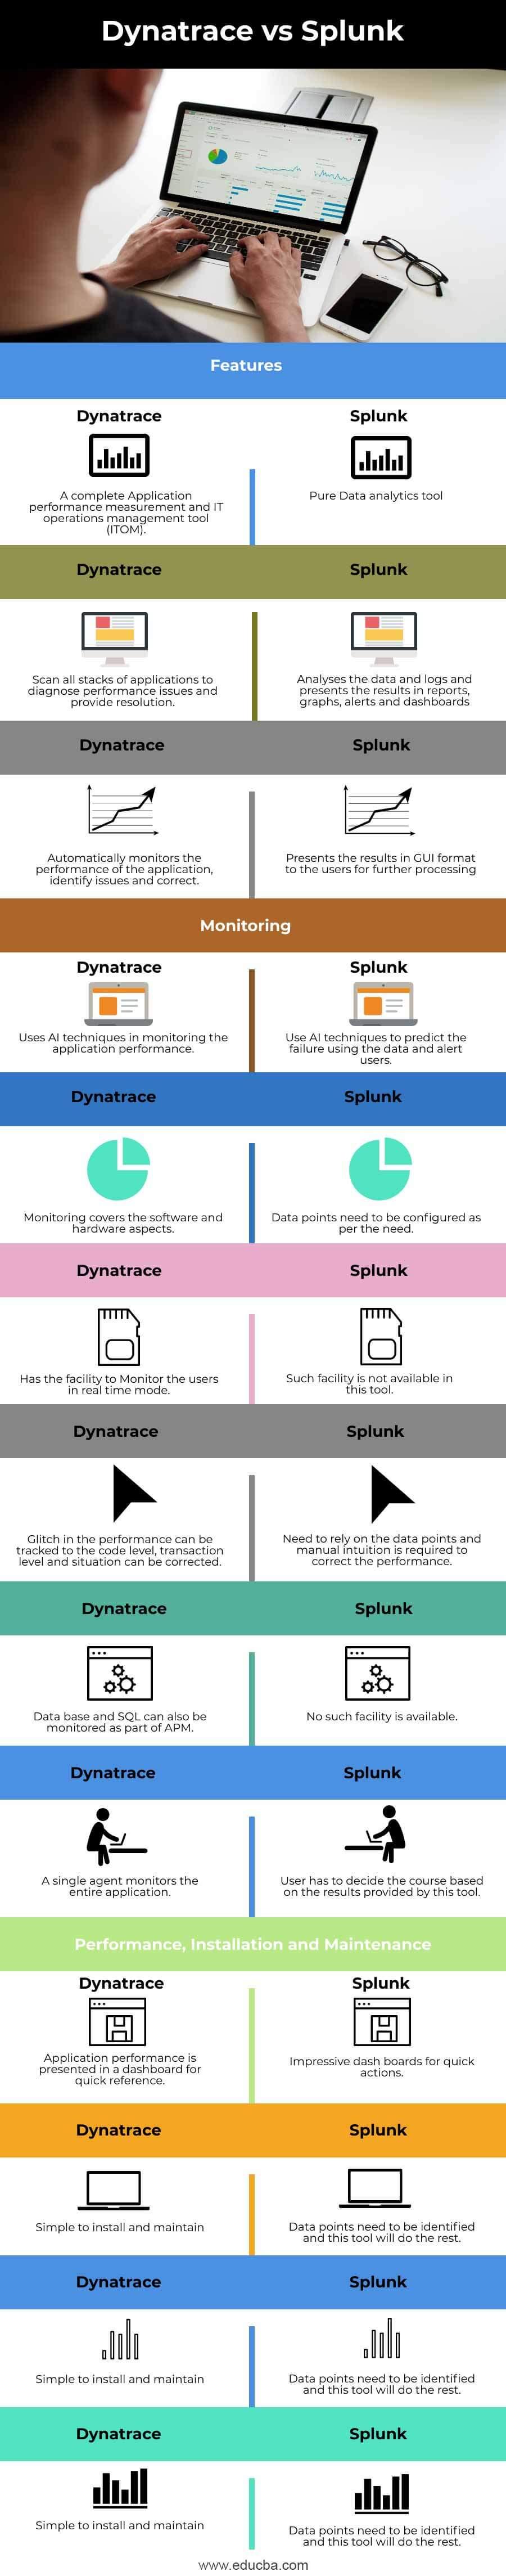 Dynatrace-vs-Splunk-info